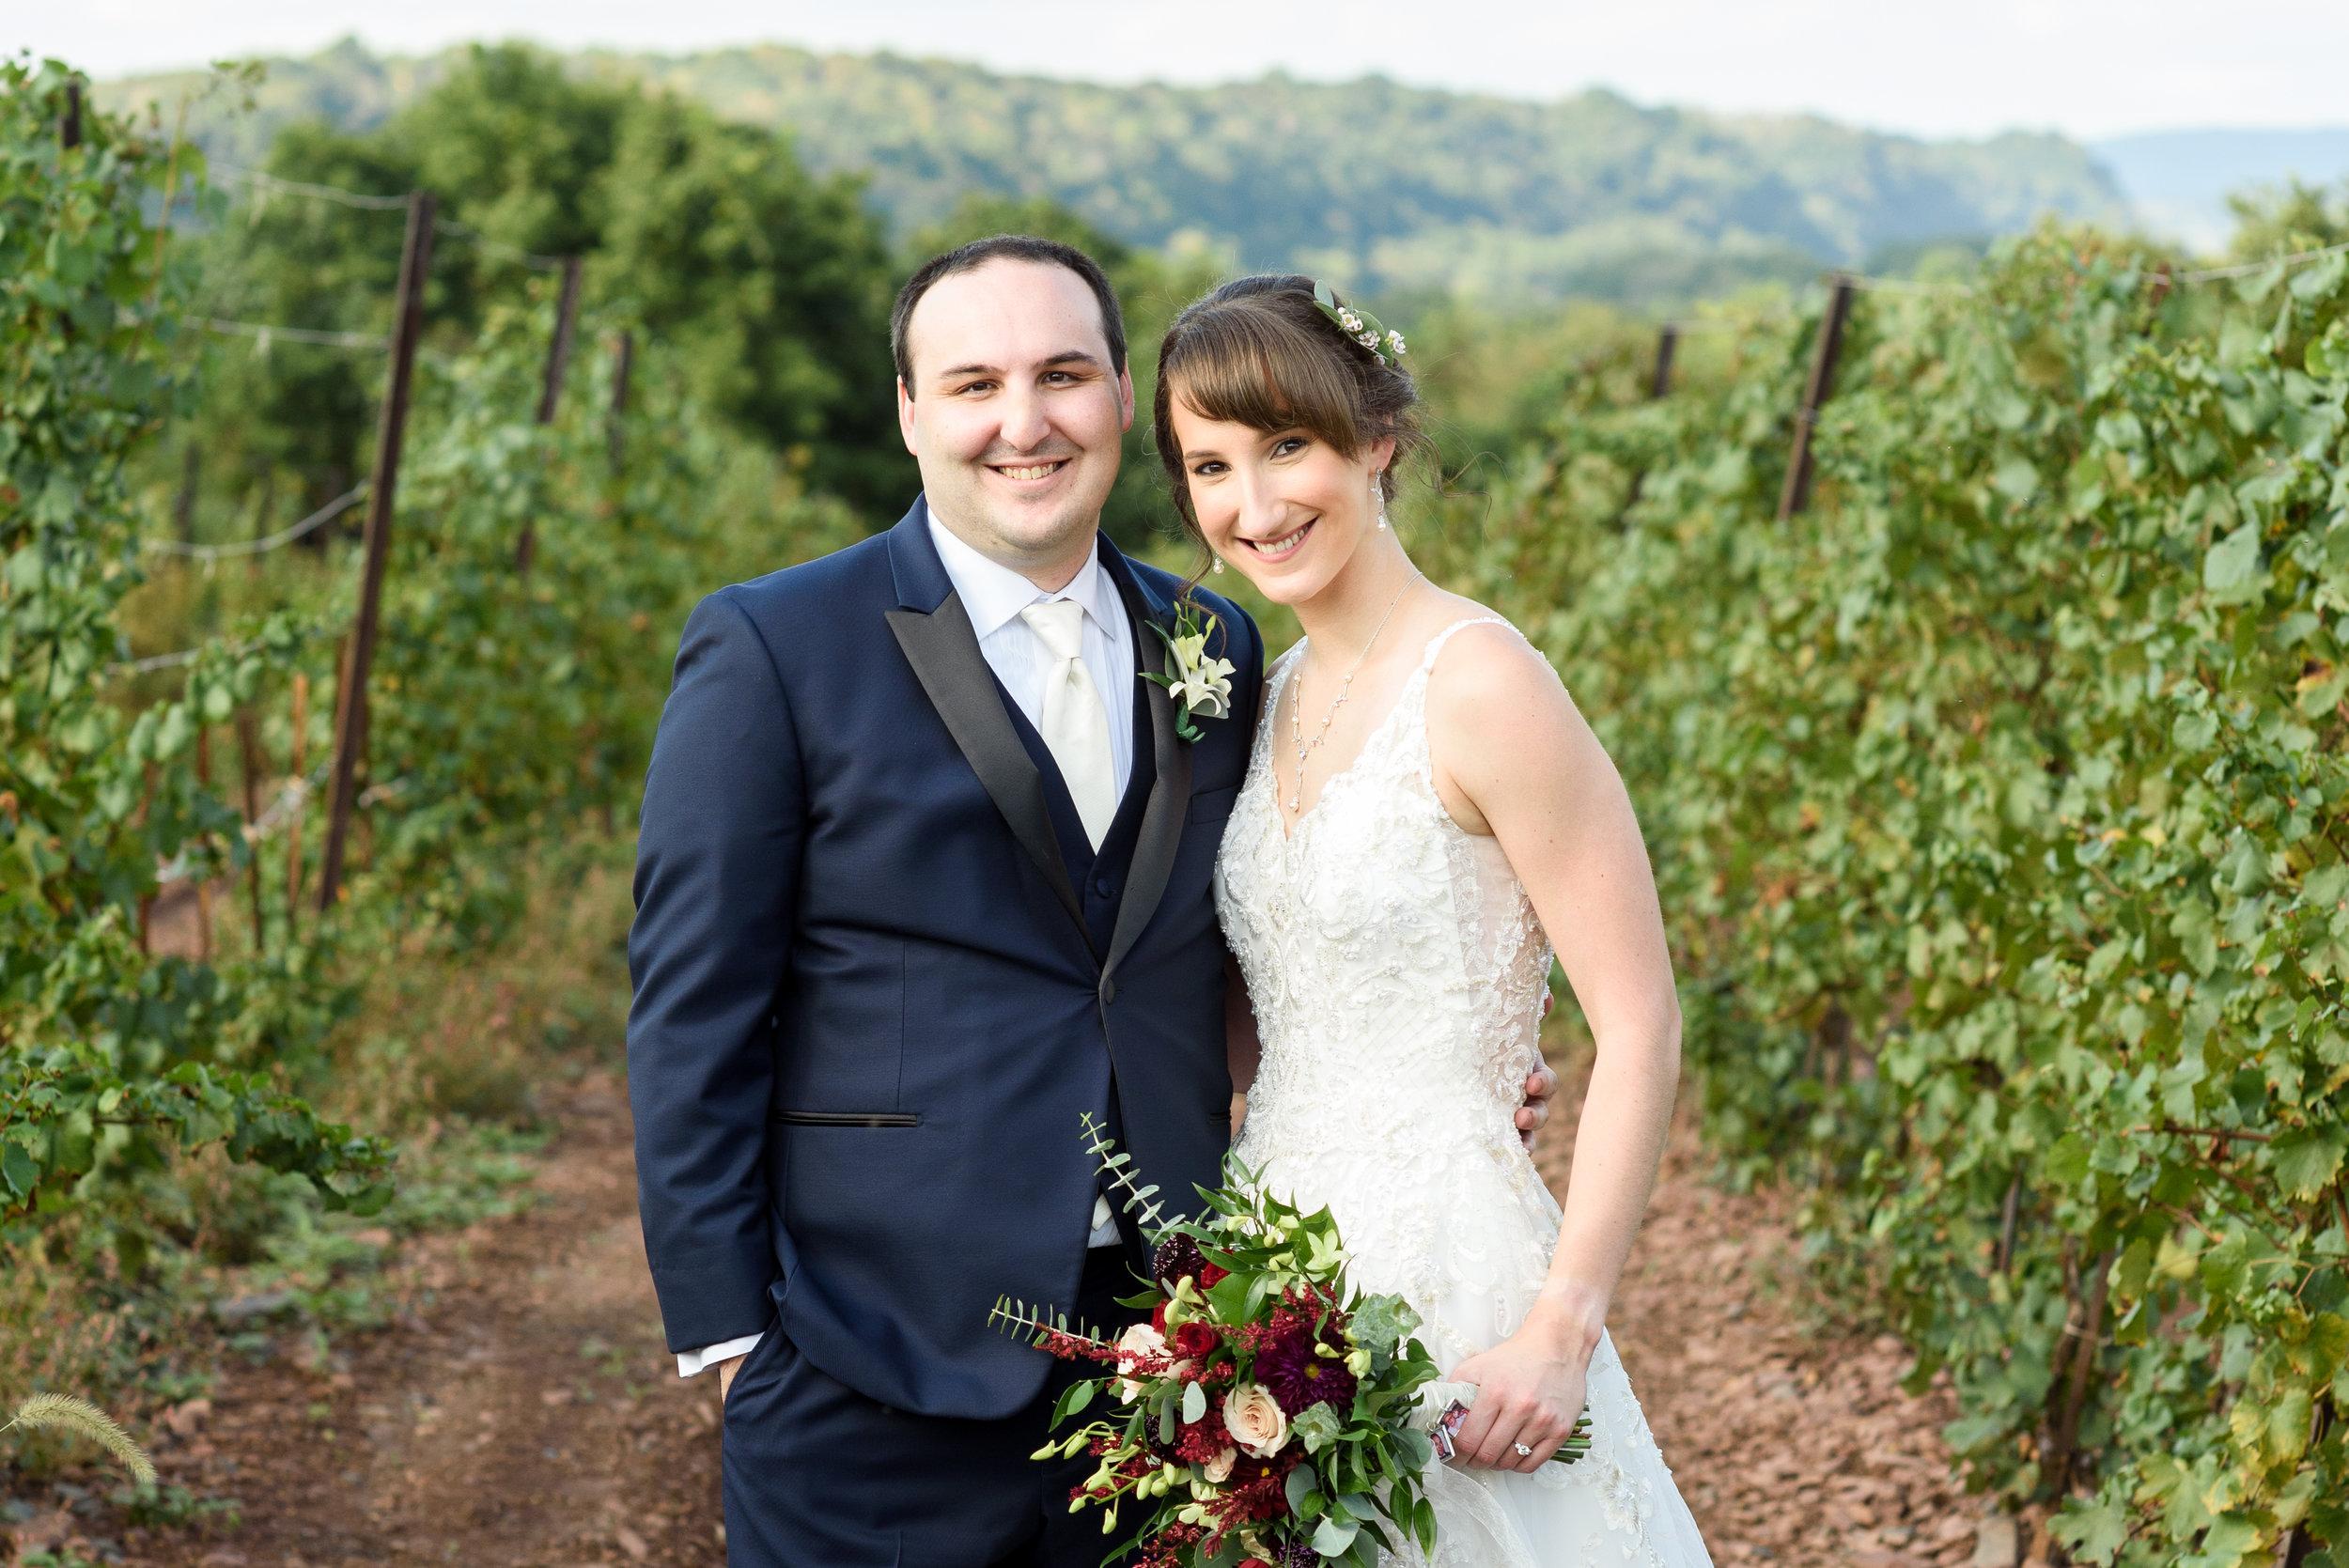 sand-castle-winery-wedding-photos